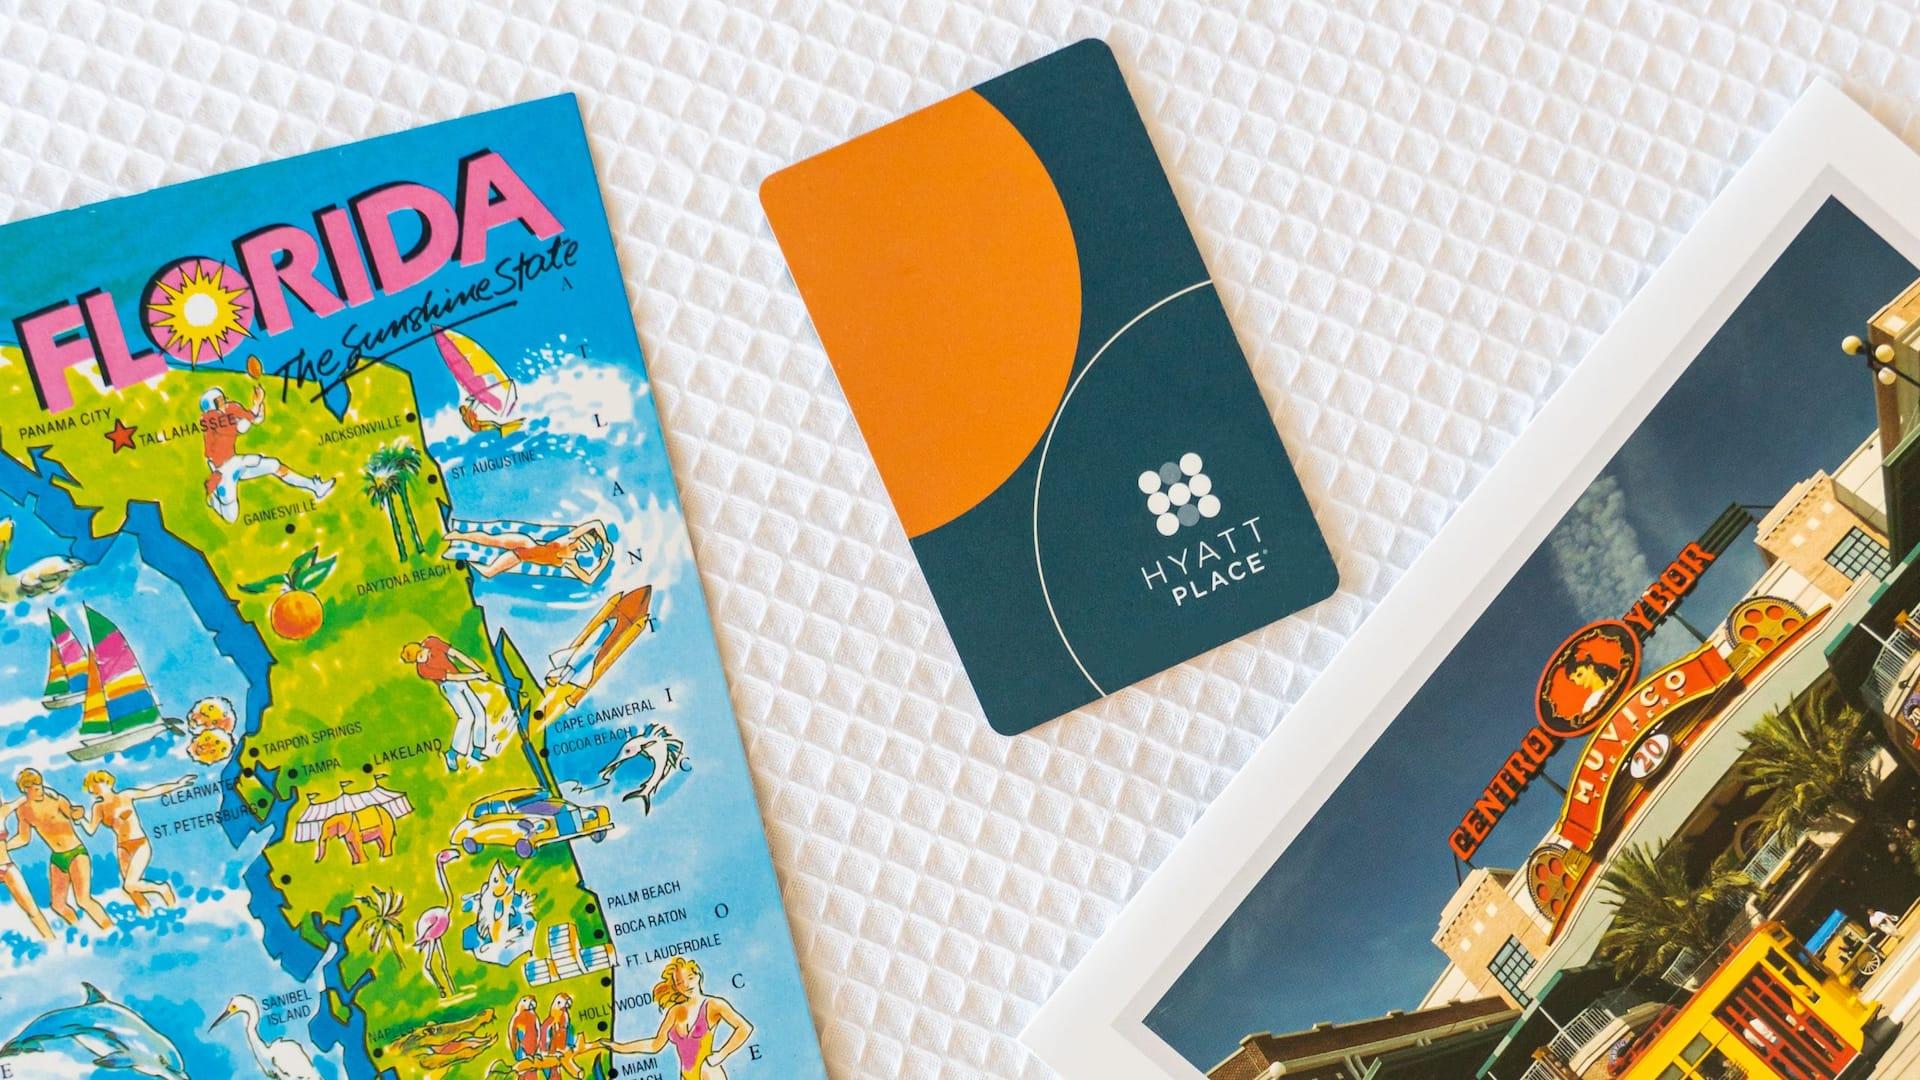 Hyatt Place Guestroom Key and Postcards